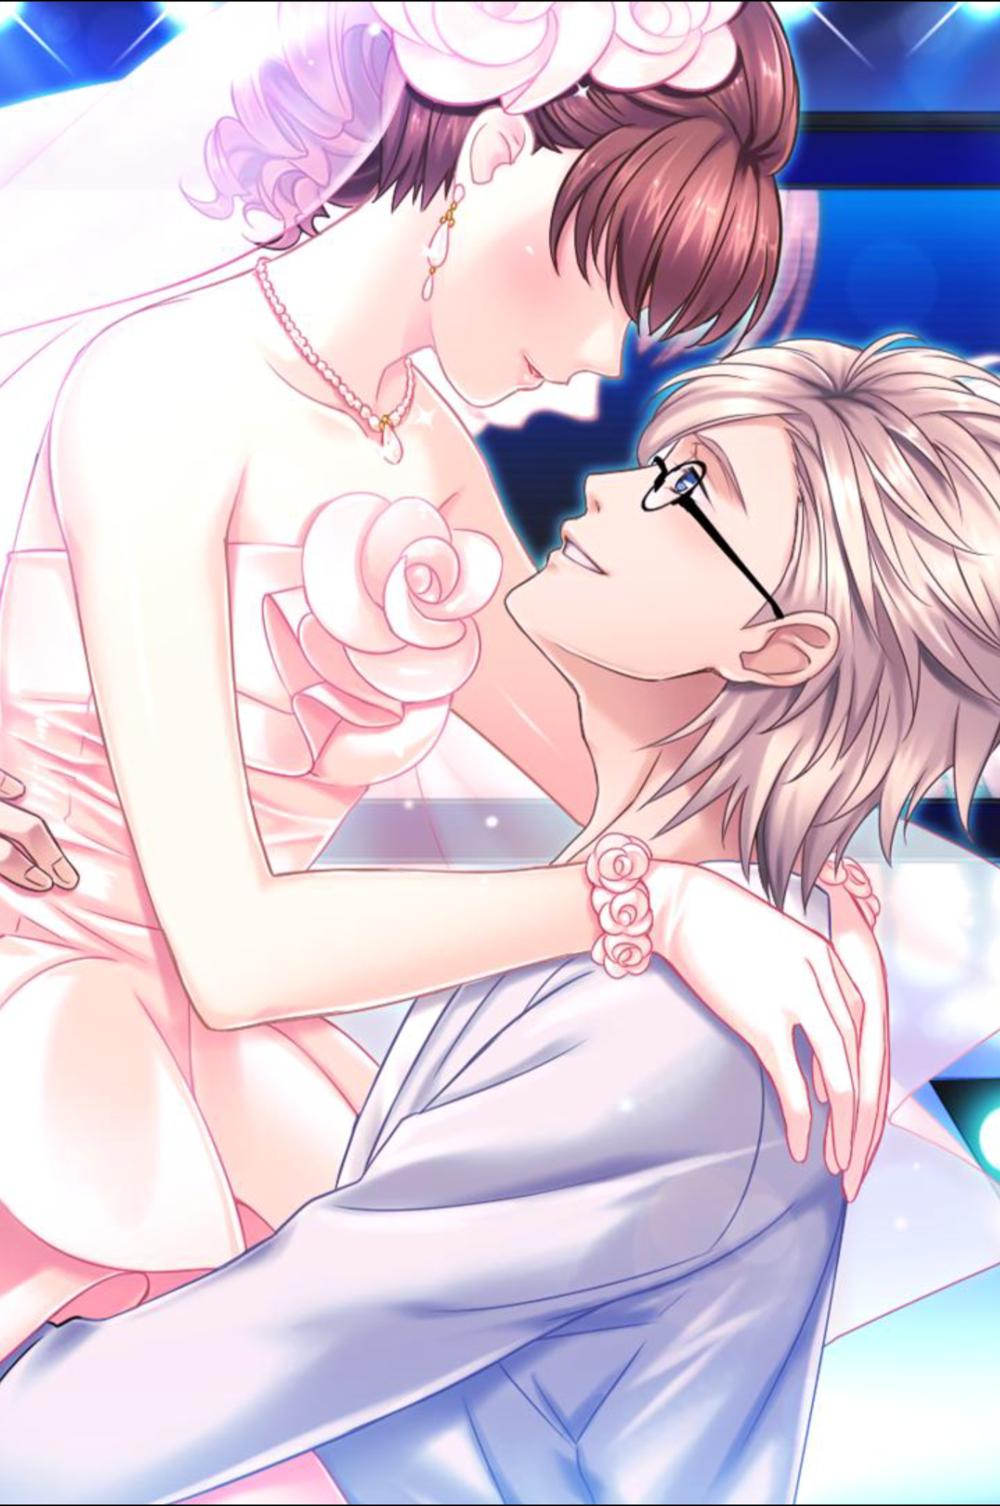 Yosuke: Happy End